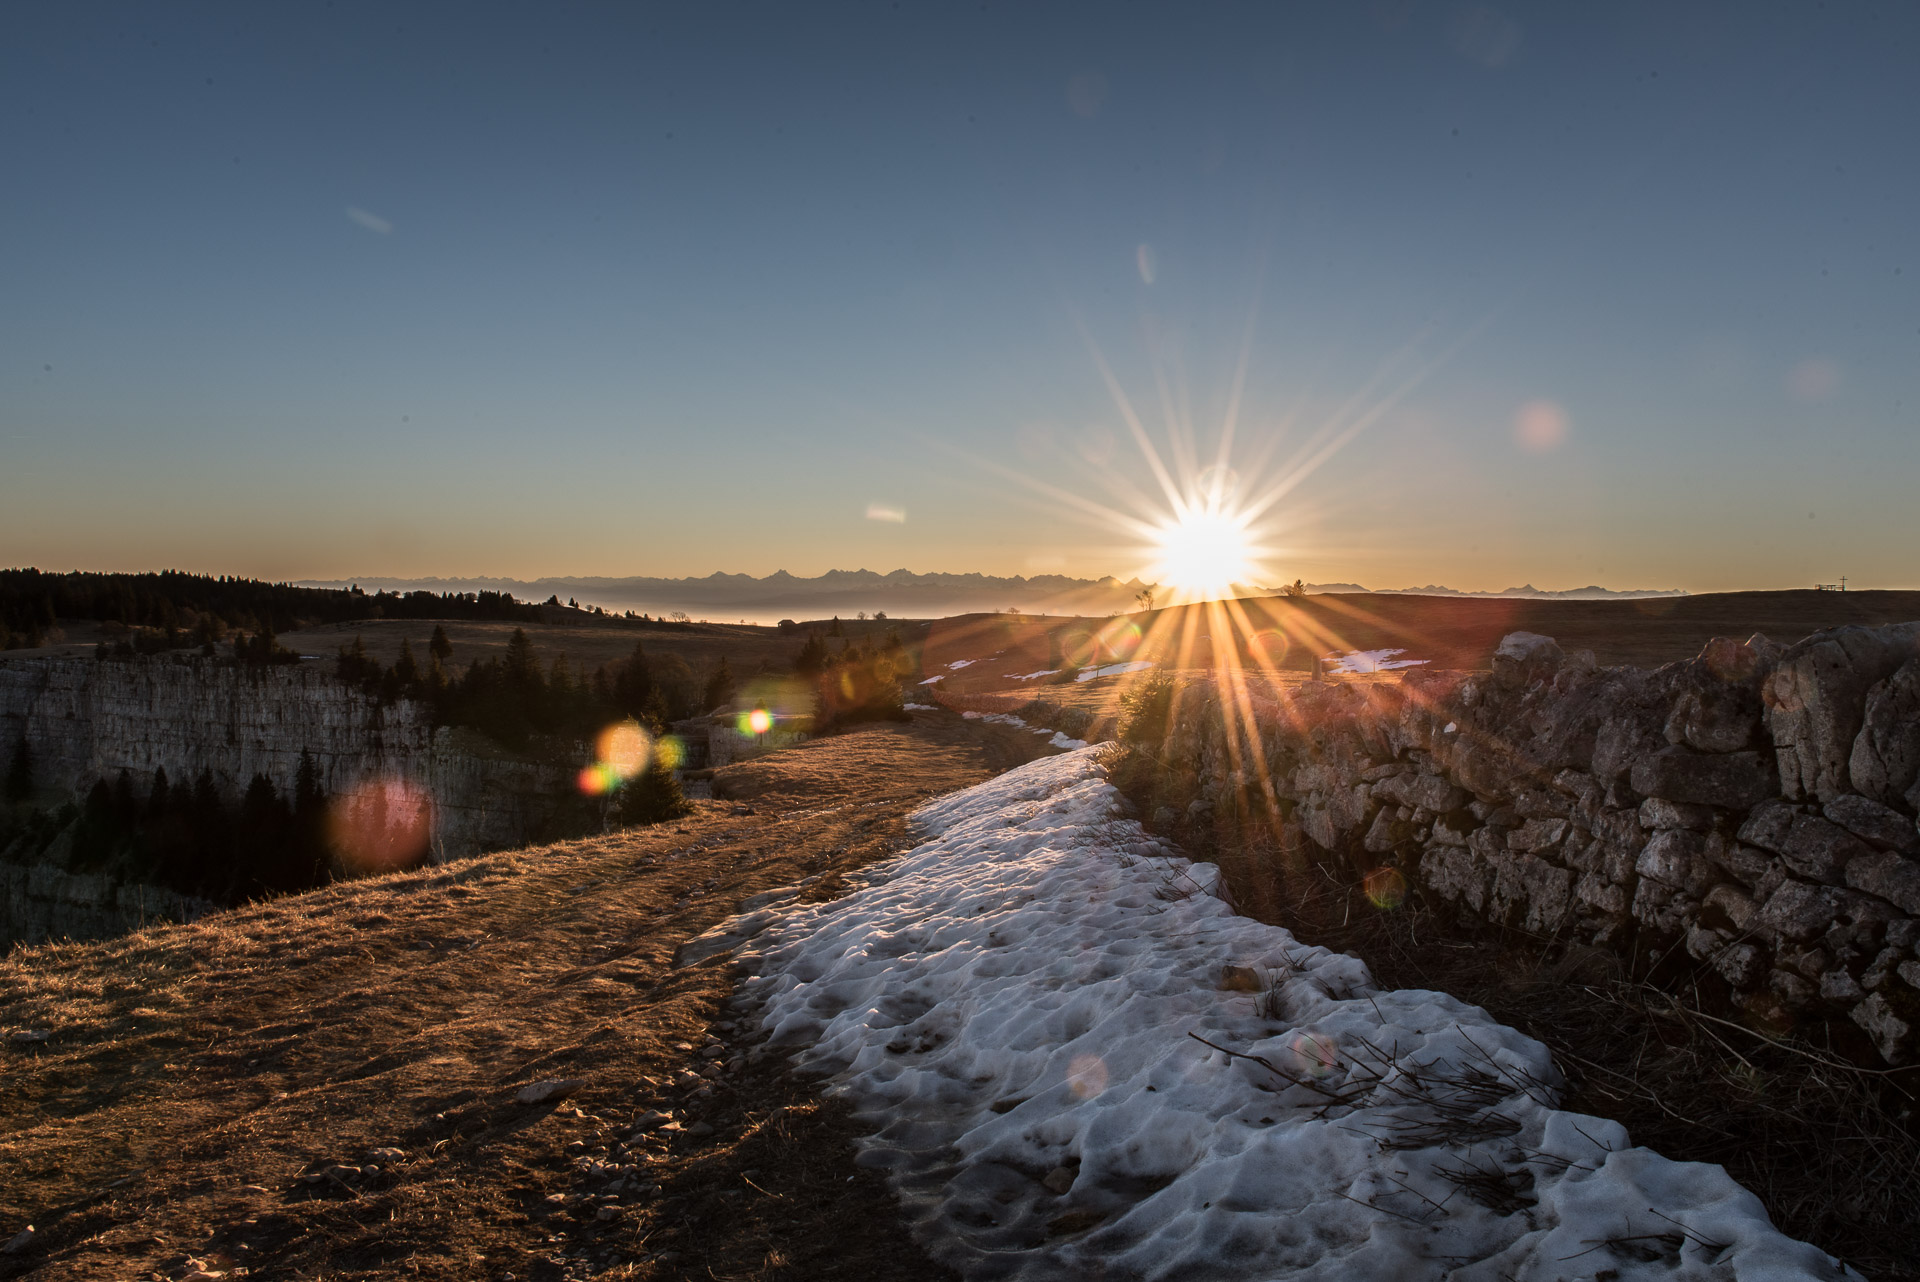 A new year has just begun: Sunrise at Creux du Van (January 1st 2017)